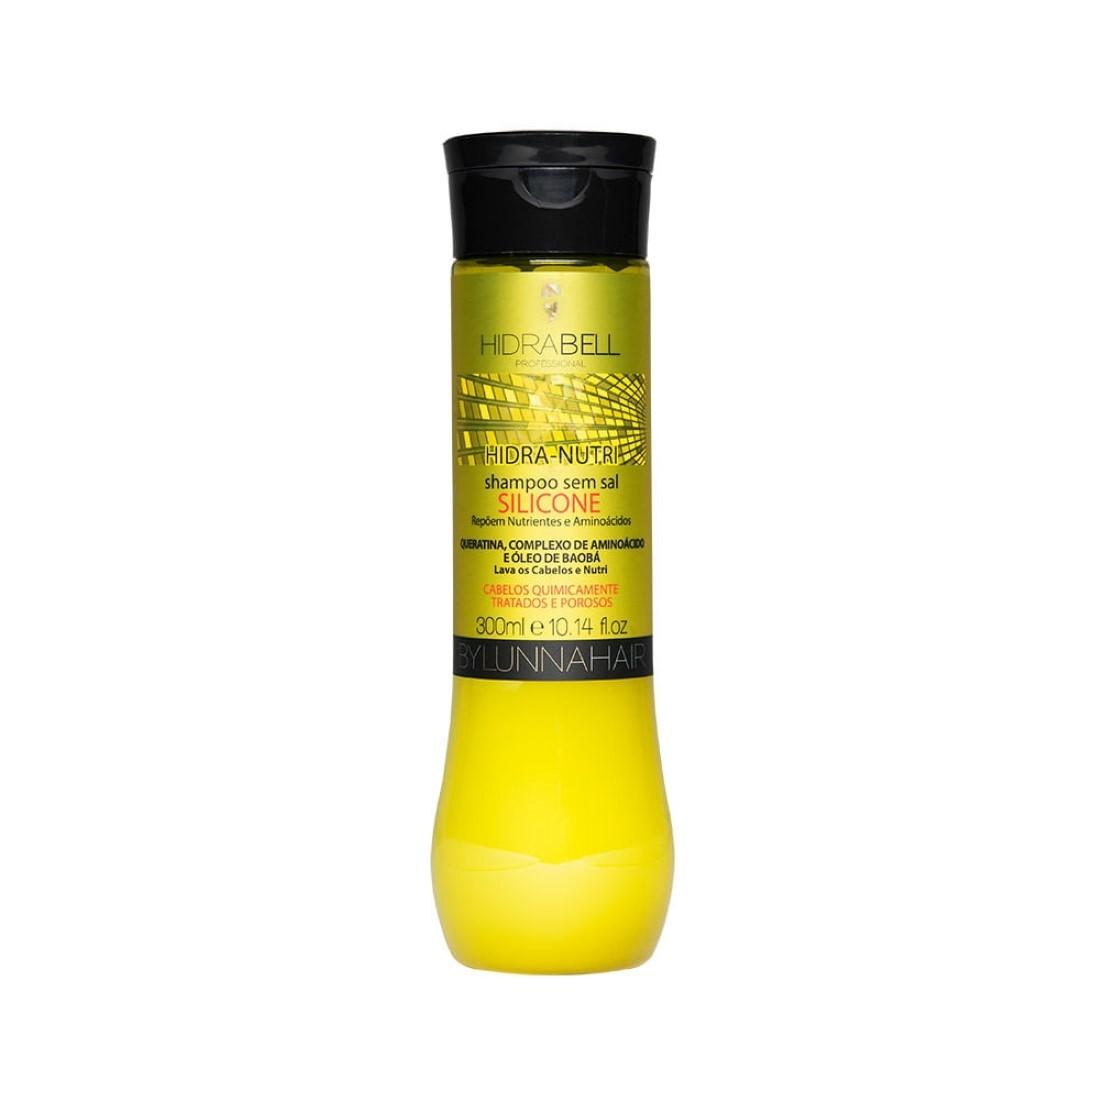 Shampoo Hidra Nutri Silicone 350ml - Hidrabell